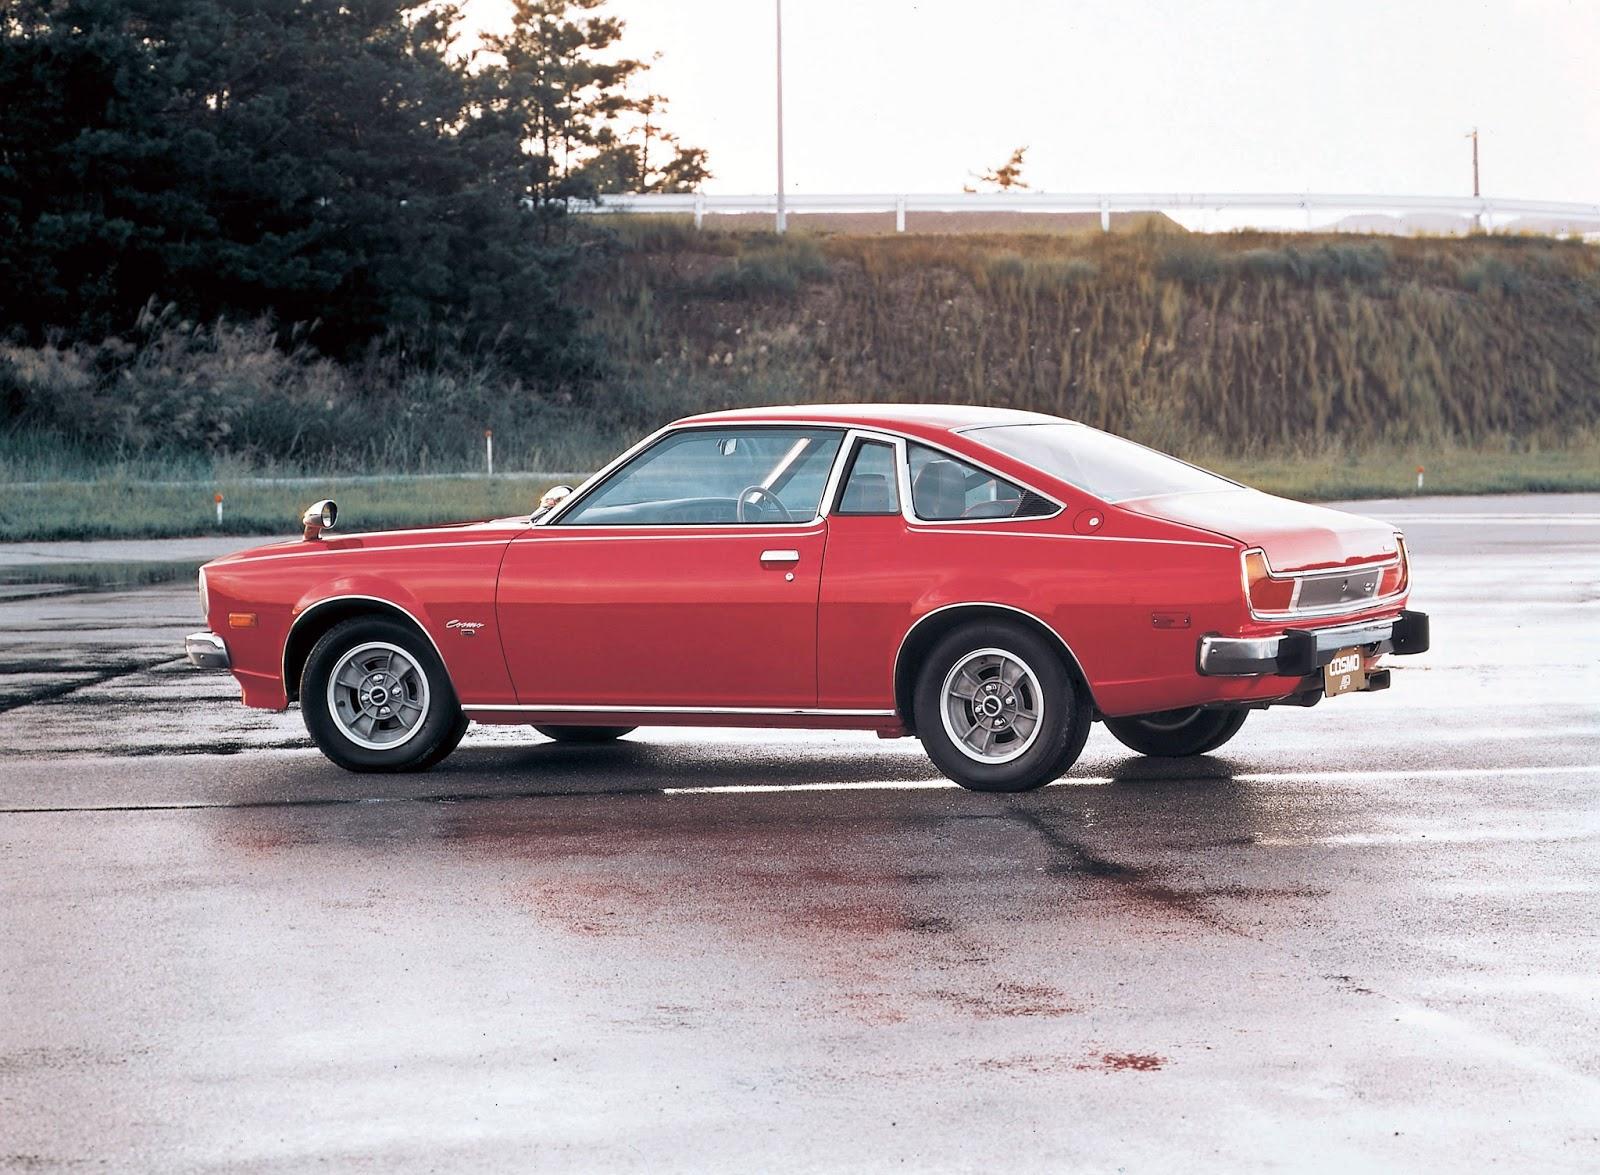 http://1.bp.blogspot.com/-FjWiWMKPWxs/URI5P8BkBvI/AAAAAAAAQmA/hS_y4rOQqFE/s1600/1975+Mazda+Cosmo+Wallpaper+3.jpg